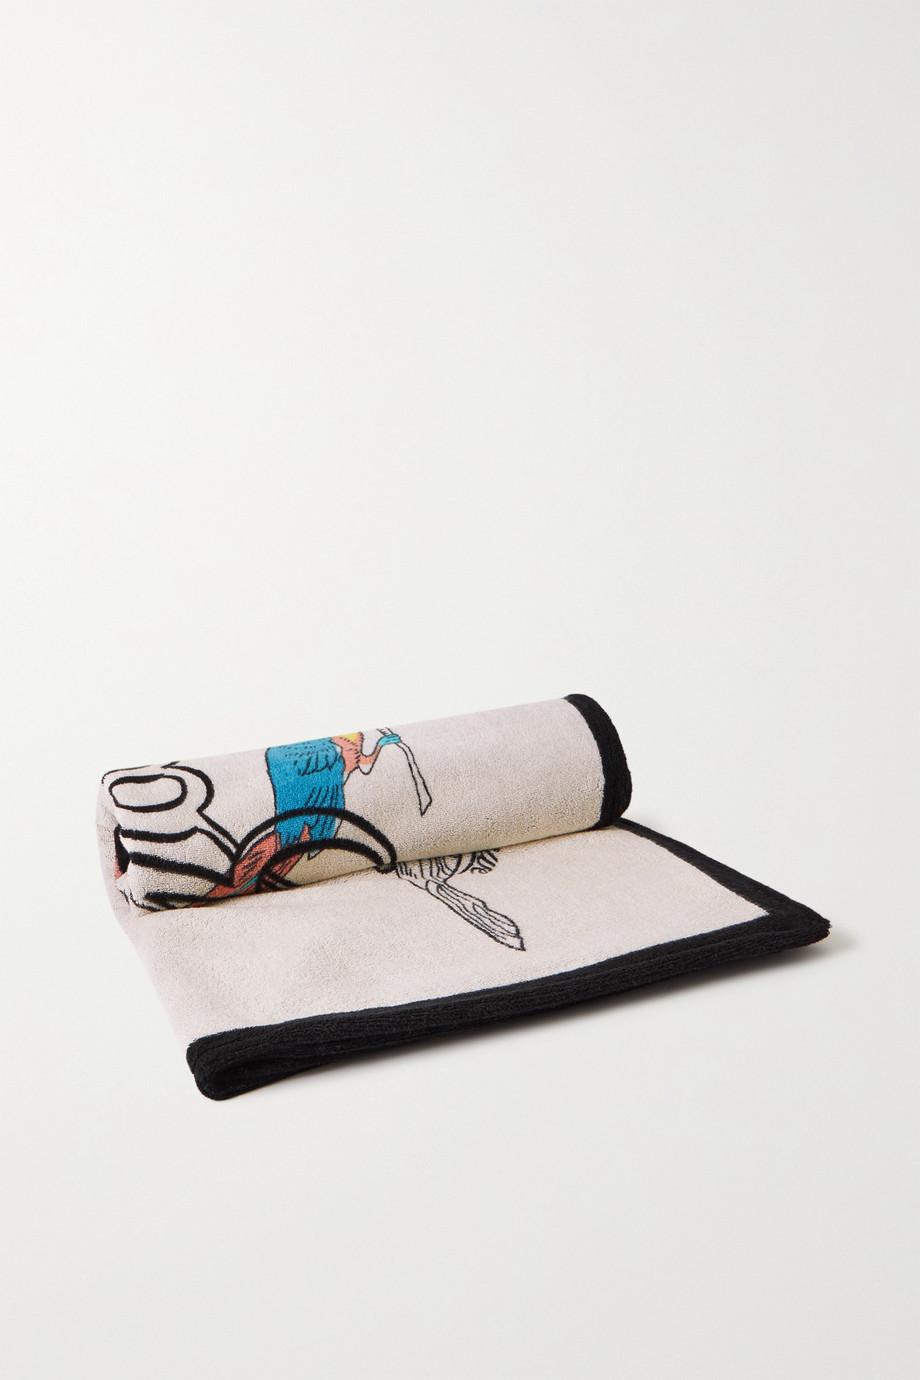 Loewe + Paula's Ibiza printed cotton-terry towel